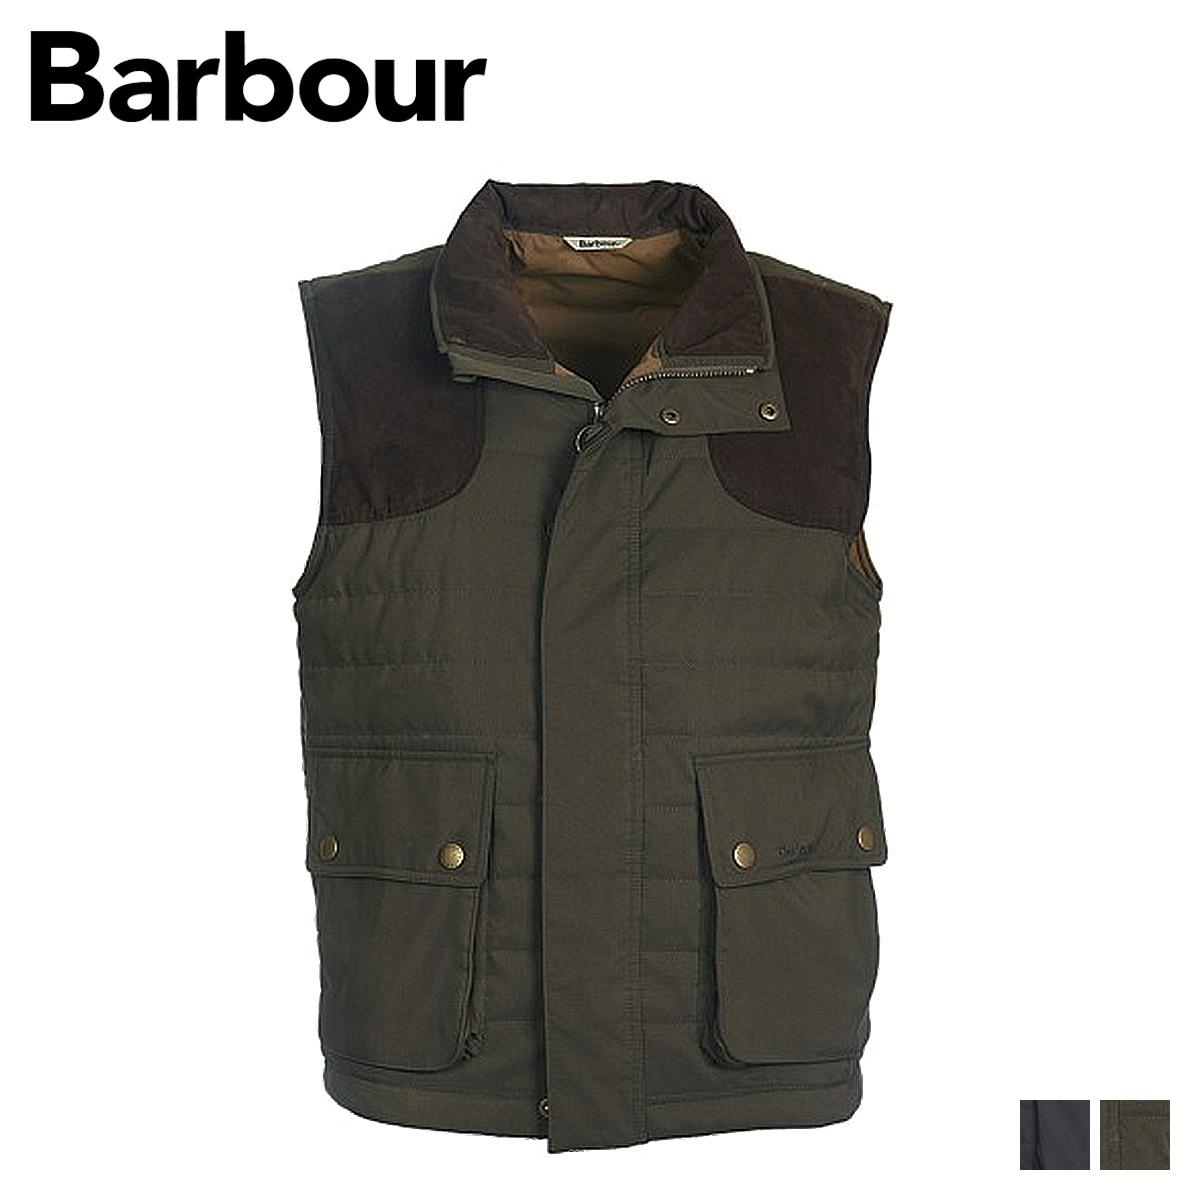 Barbour バブアー ベスト メンズ ジャケット キルトジャケット BARBOUR AVOCET QUILT JAKECT